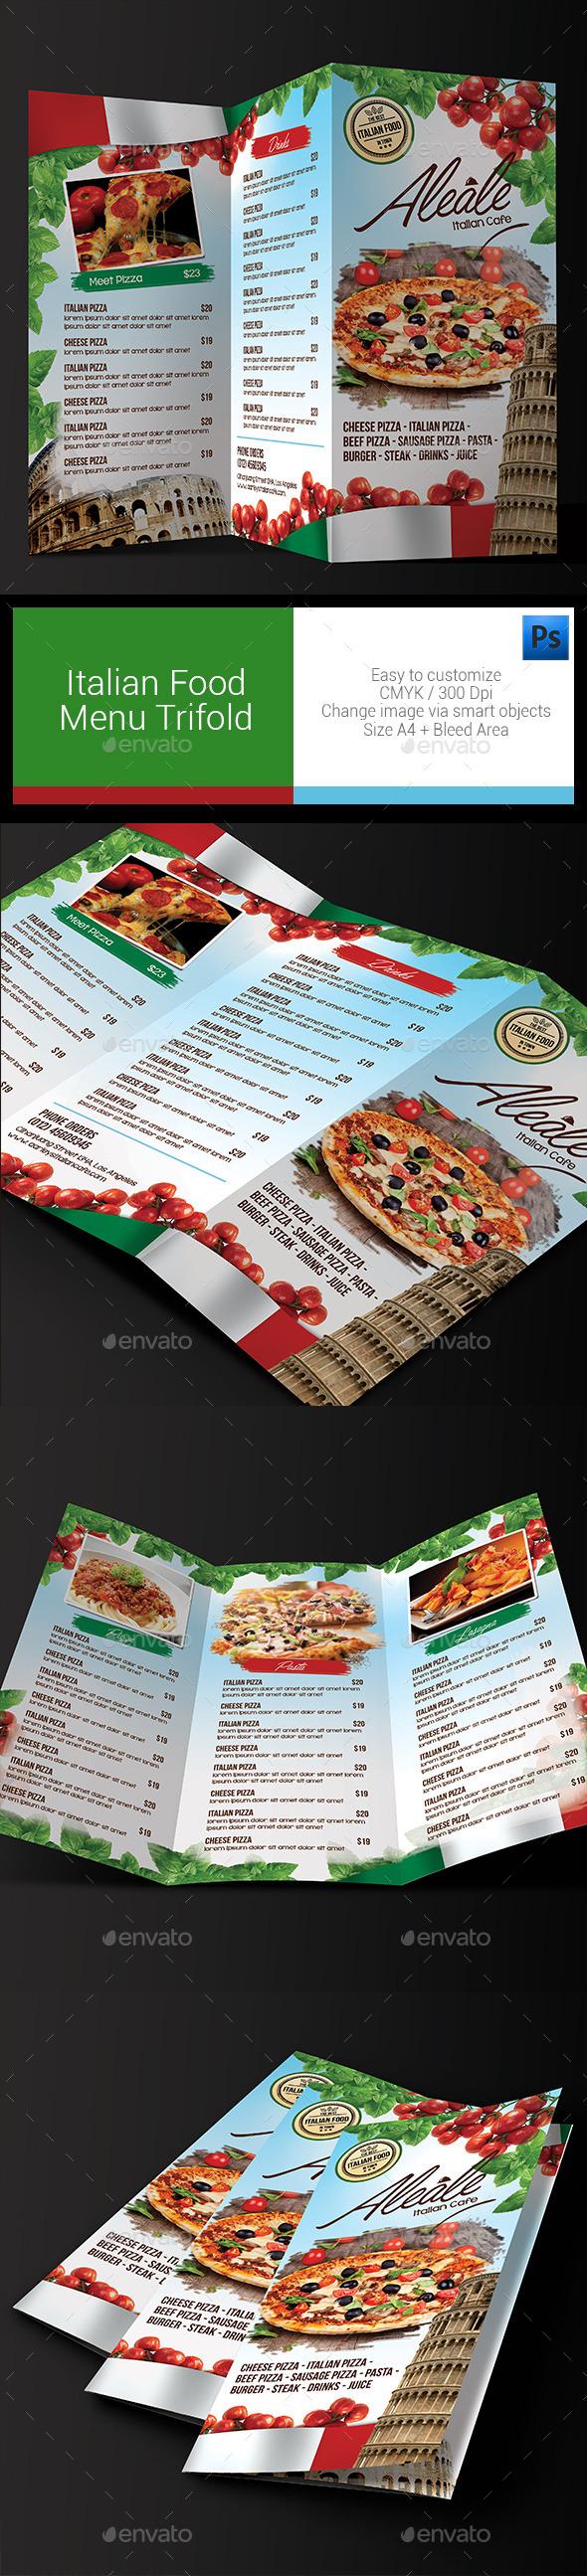 Italian Food Menu Trifold